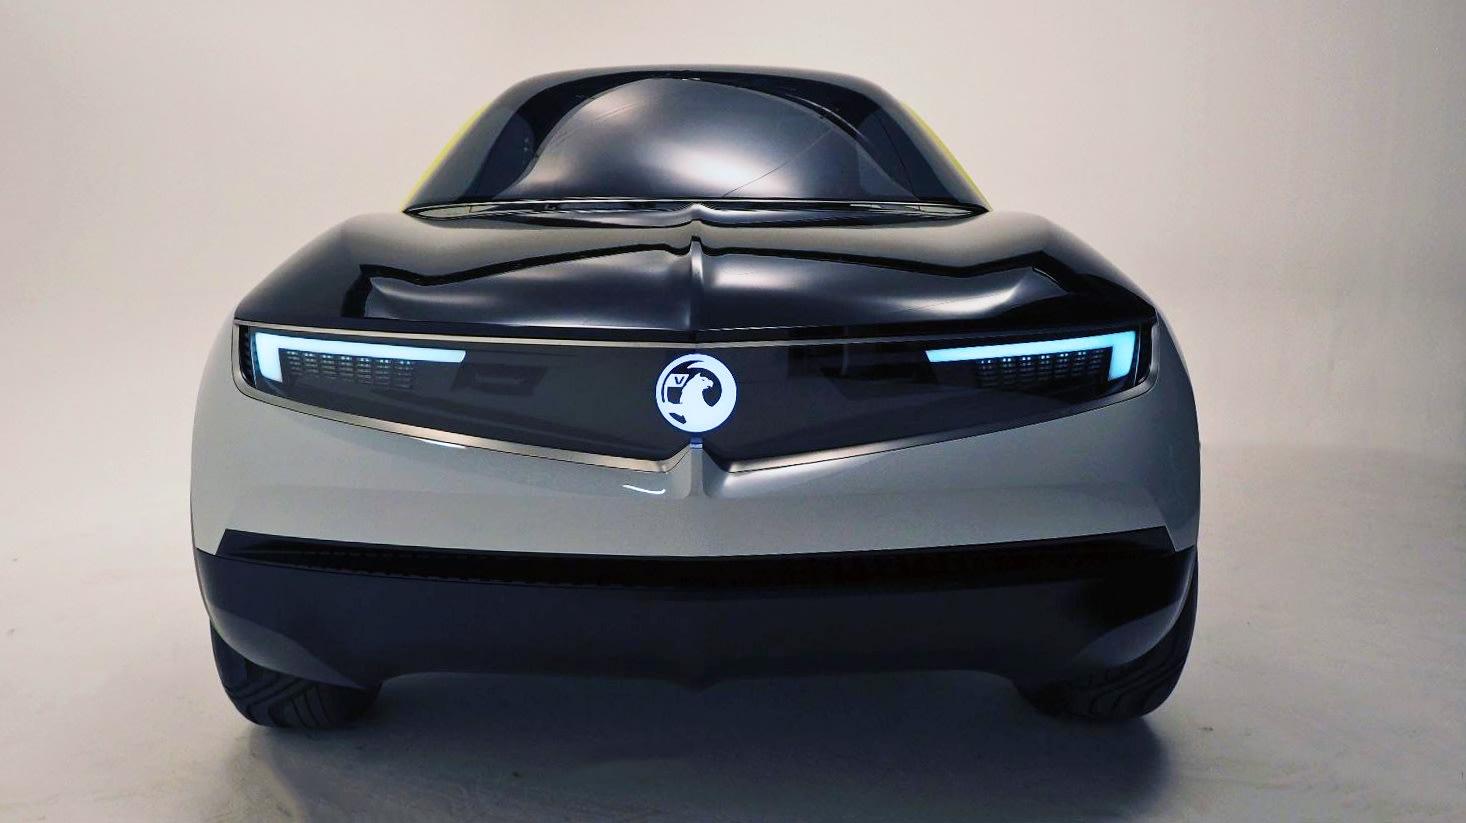 Vauxhall GTX concept